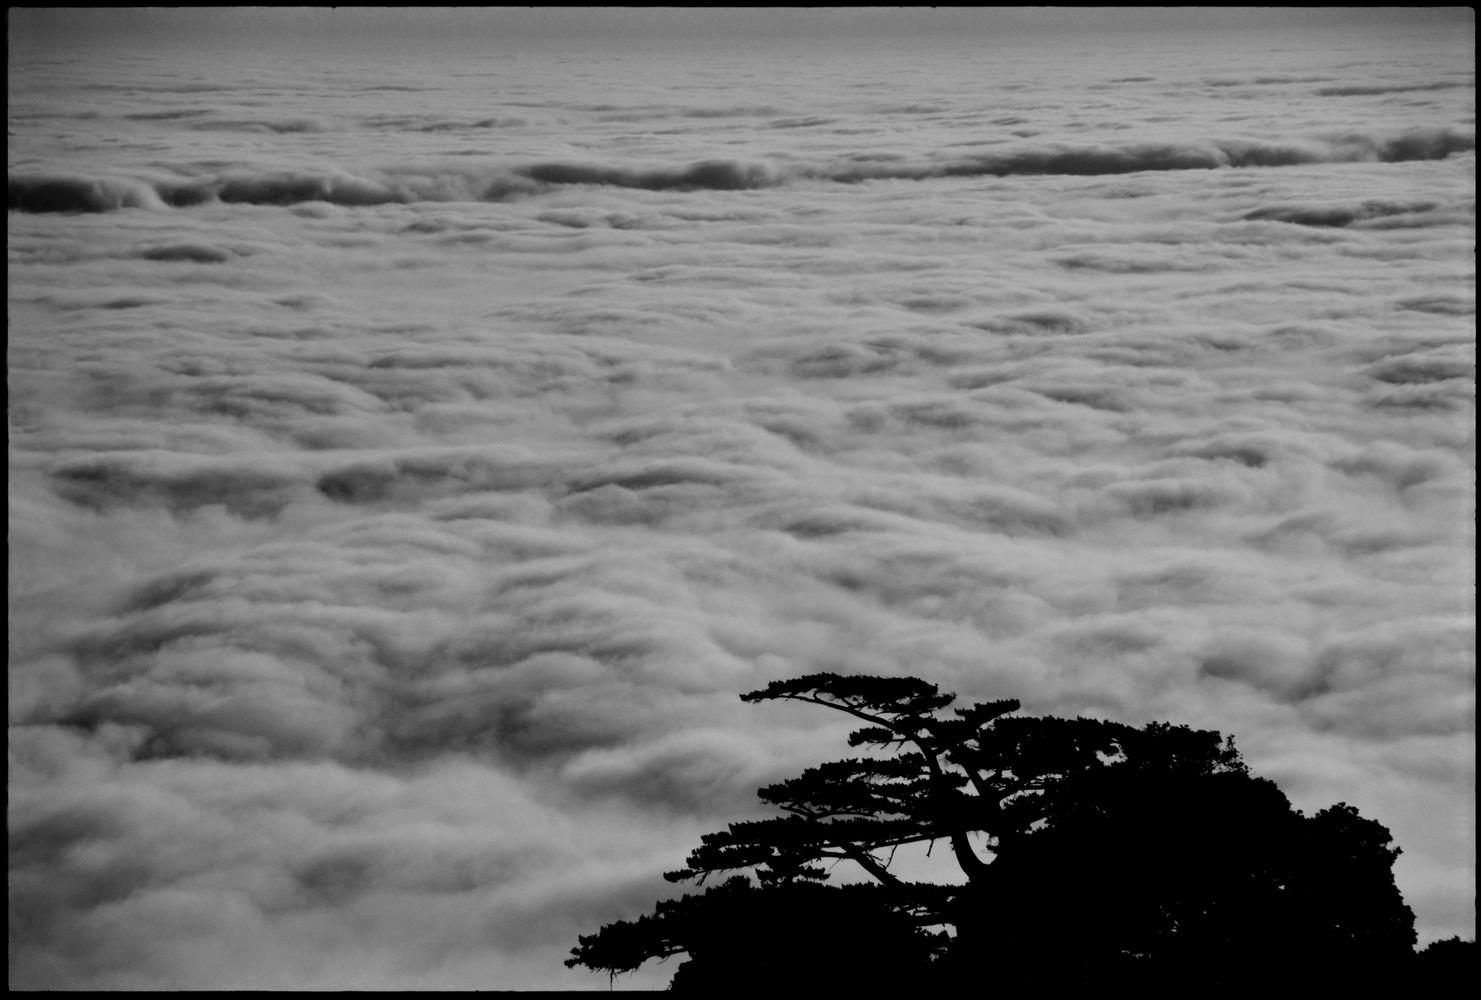 Mt Tam, 1999 by Julian Rad